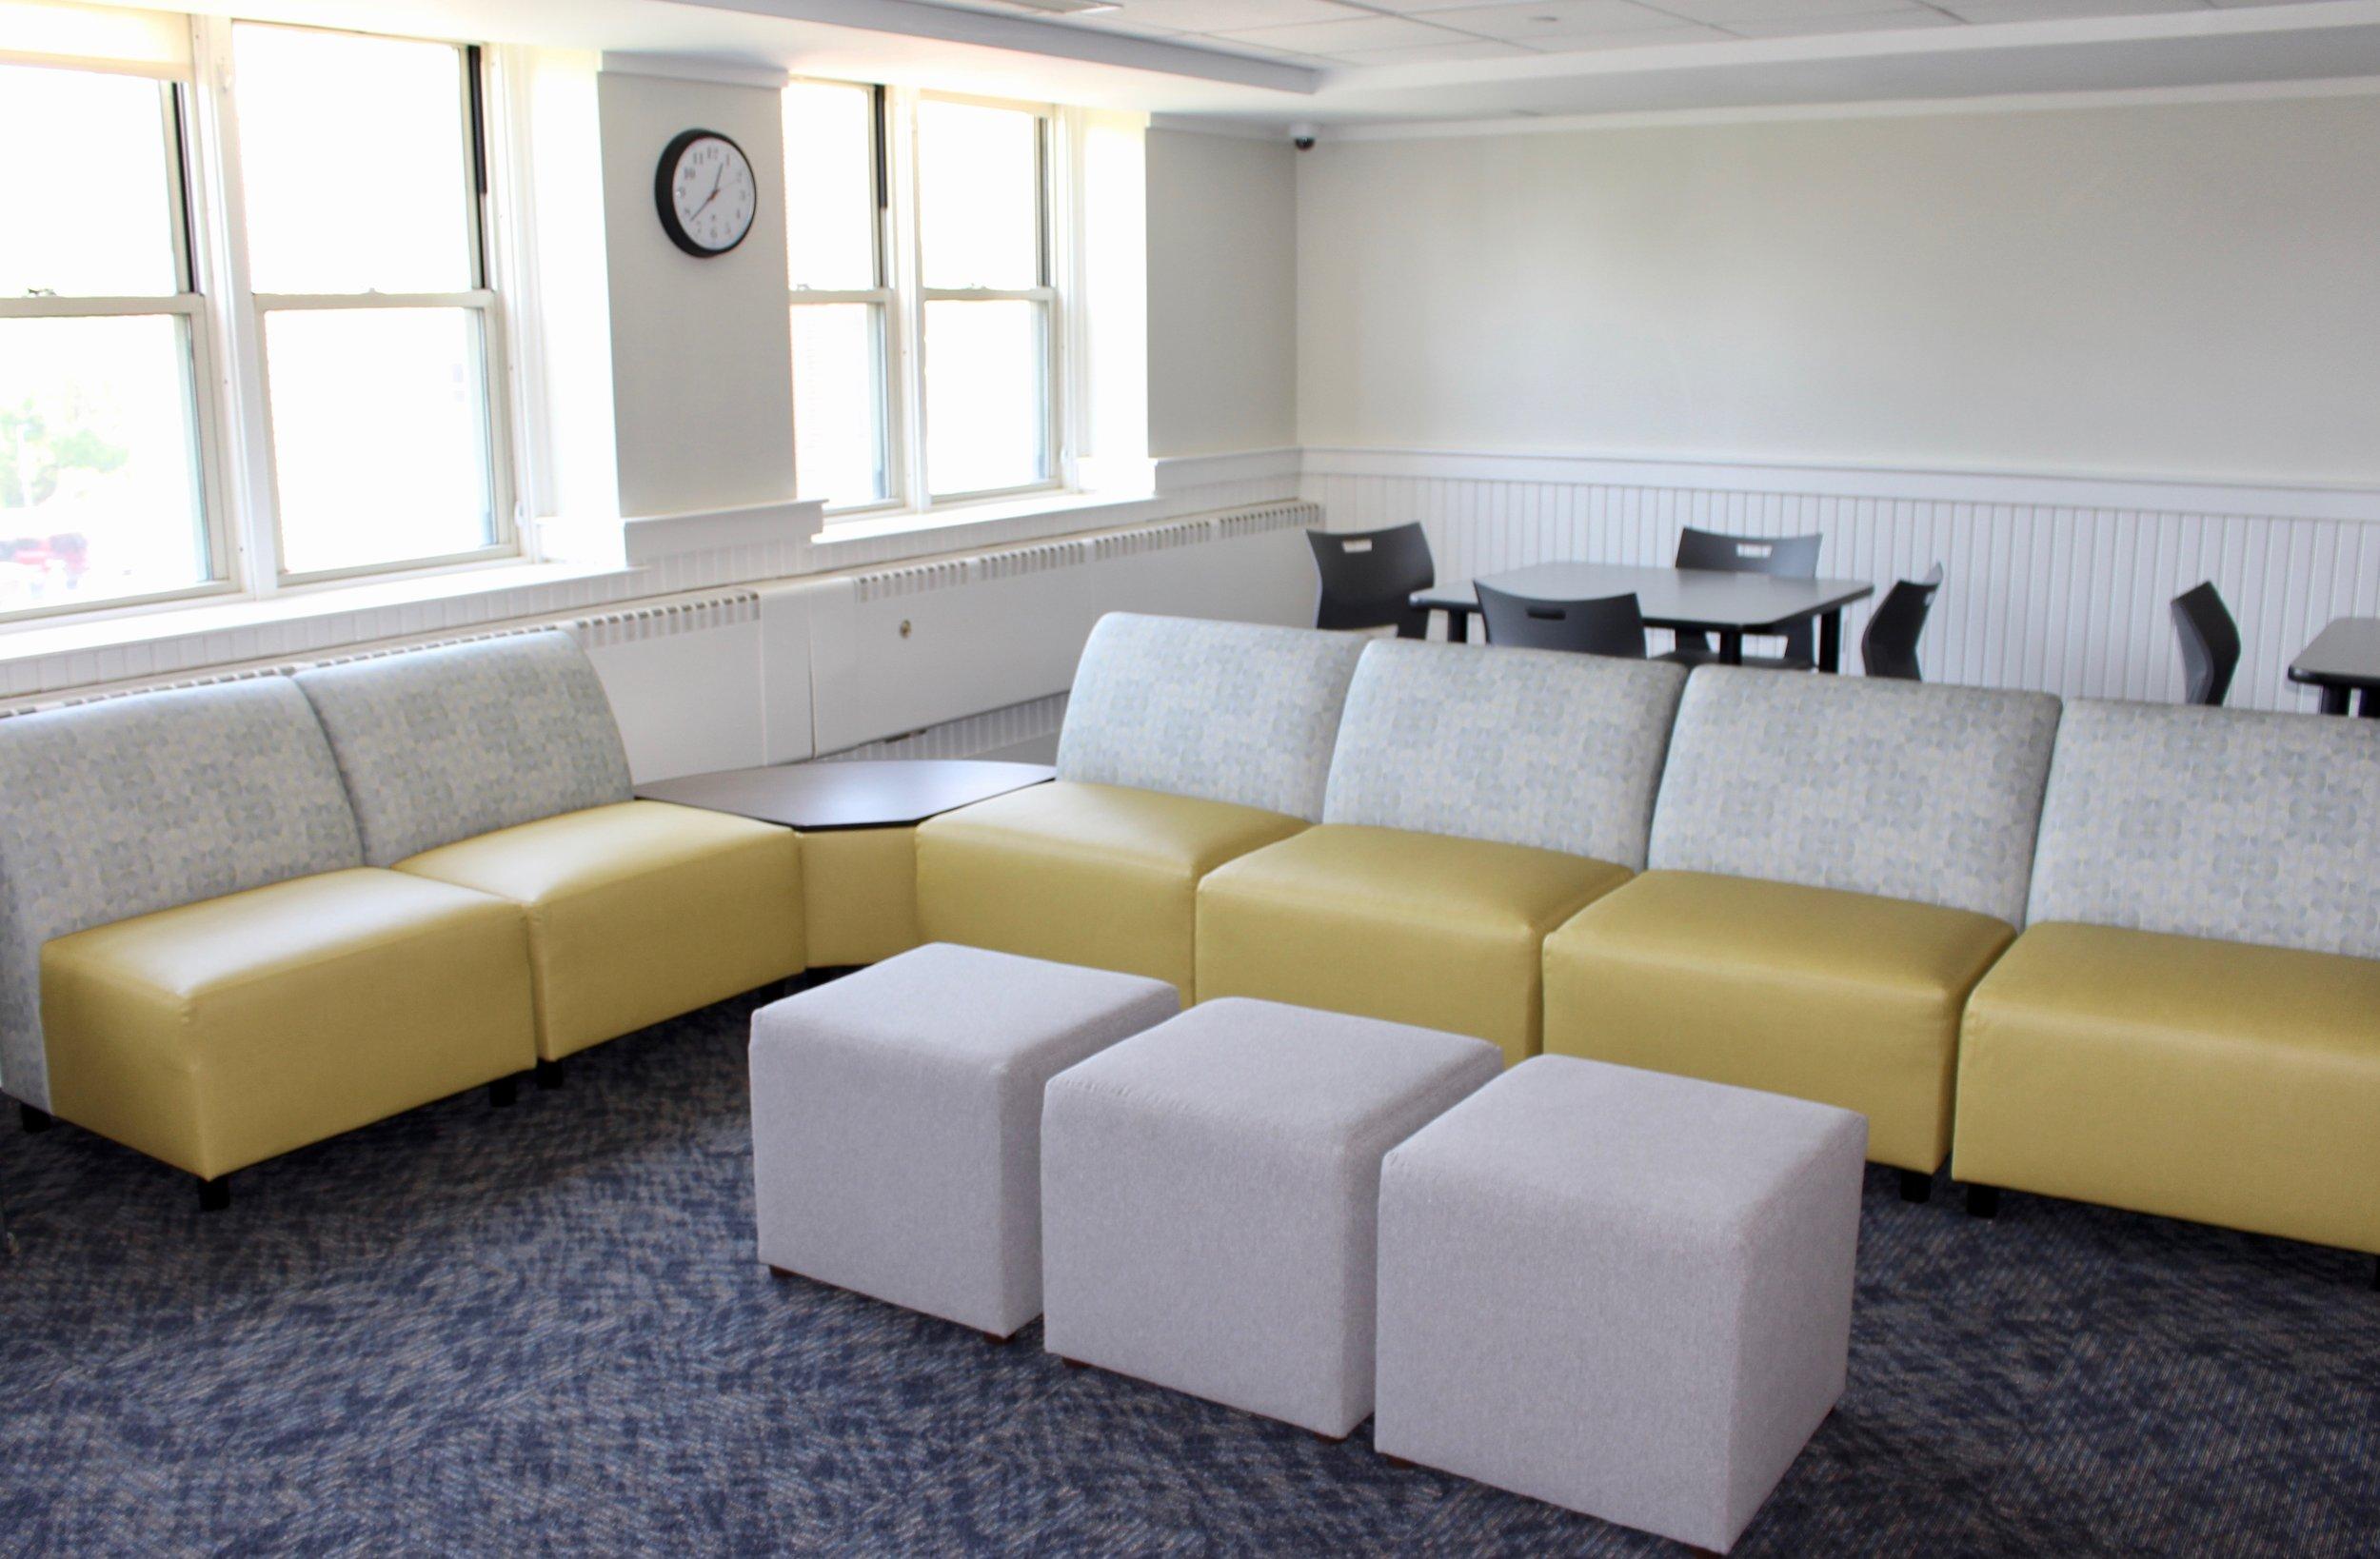 hadley modular seating with dalton ottoman